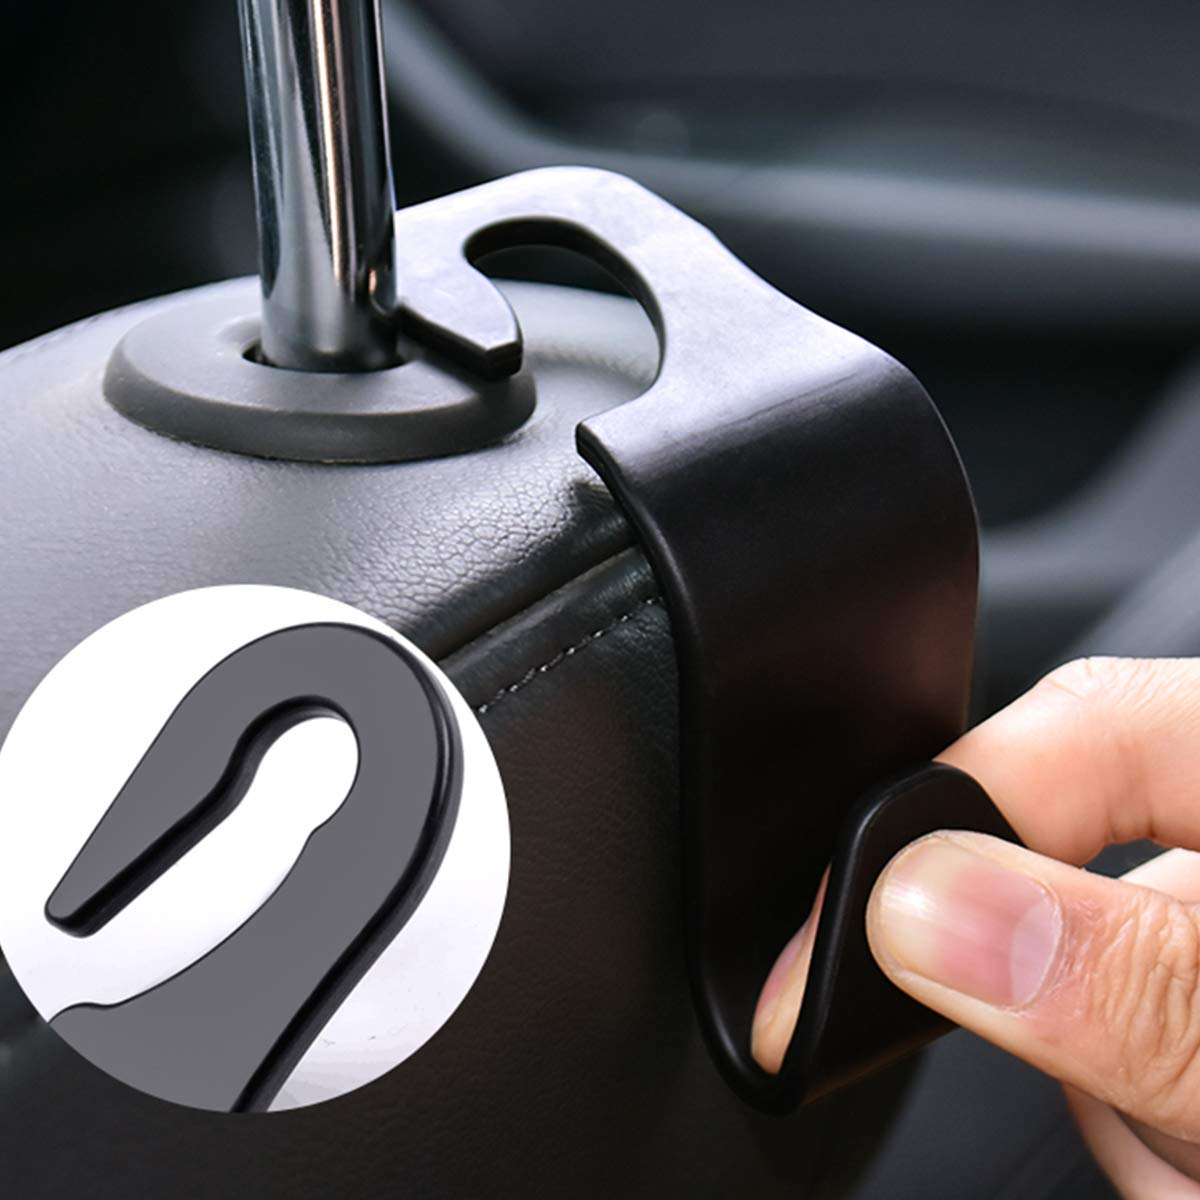 Black 12pcs Car Storage Hooks 11cm Headrest Hooks Plastic Car Back Seat Hanger Hook with Curved Design,Vehicle Car Organizer Storage Holder for Handbags,Baby Supplies,Coats